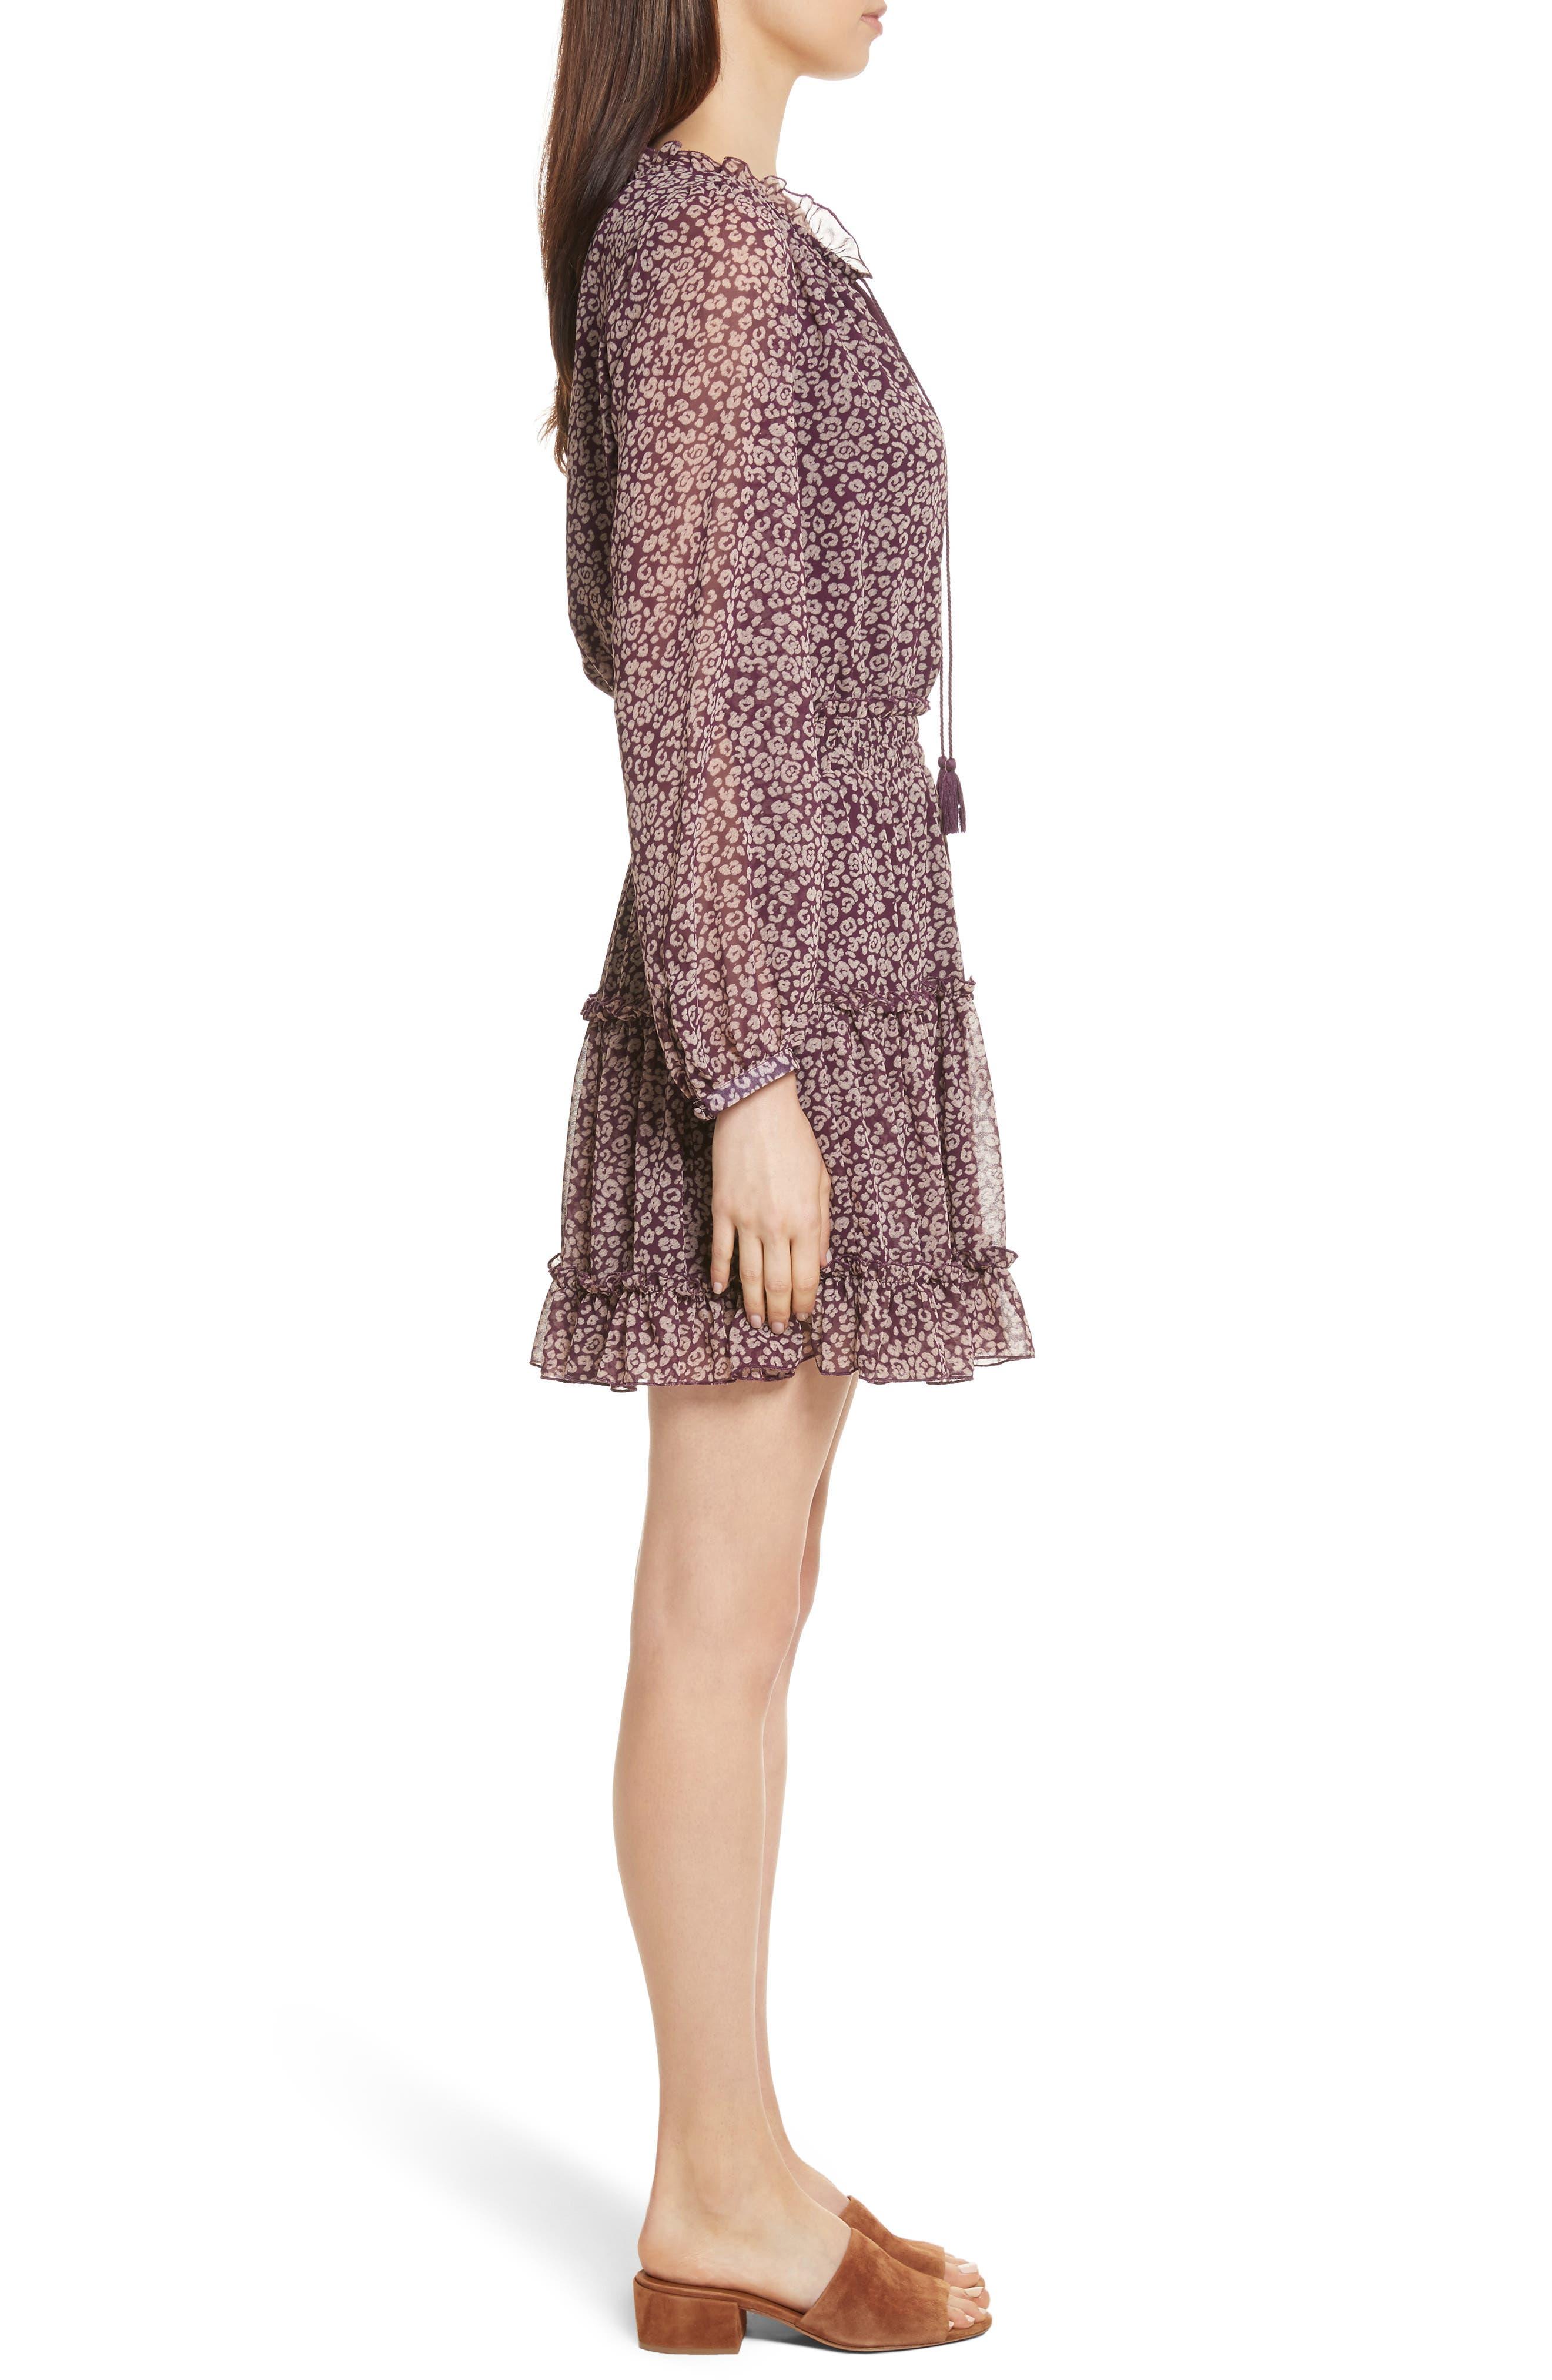 Rosemary A-Line Dress,                             Alternate thumbnail 3, color,                             Potent Purple Leopard